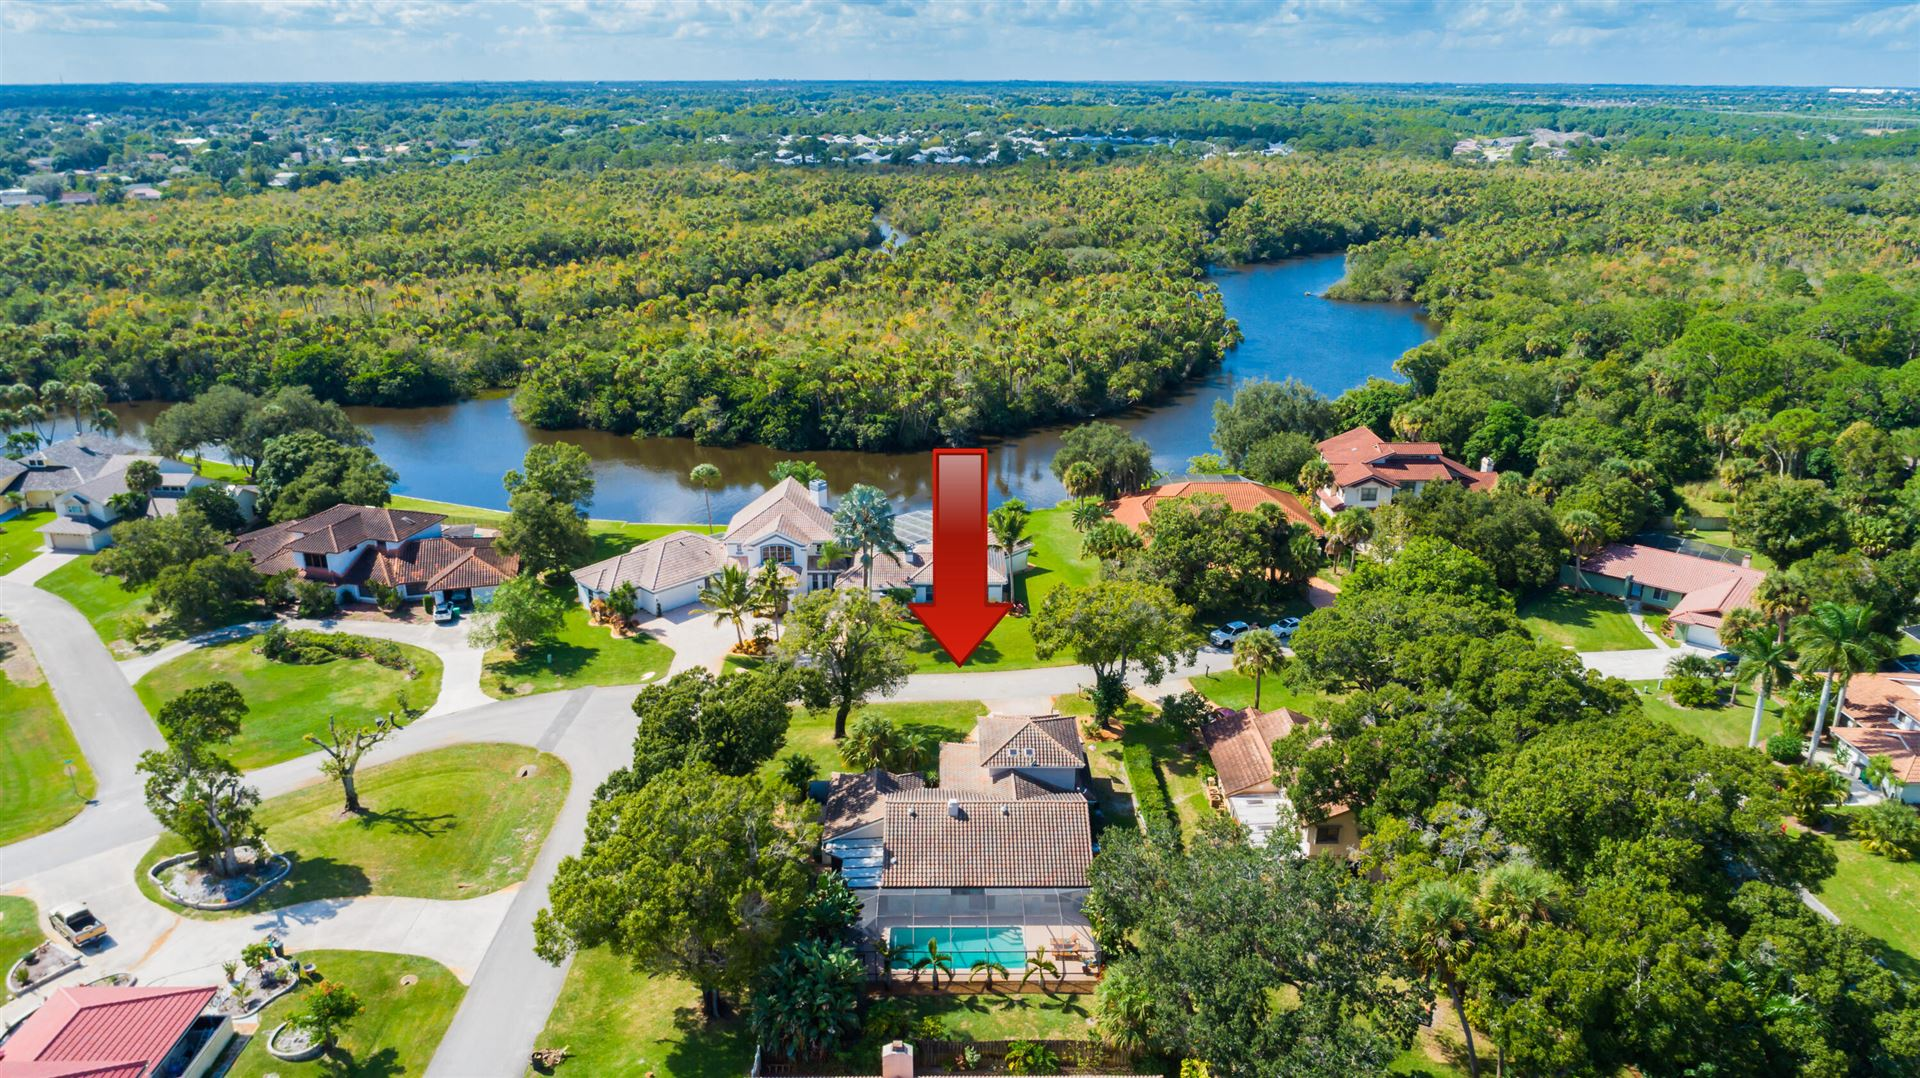 7206 Elyse Circle, Fort Pierce, FL 34952 - MLS#: RX-10752748